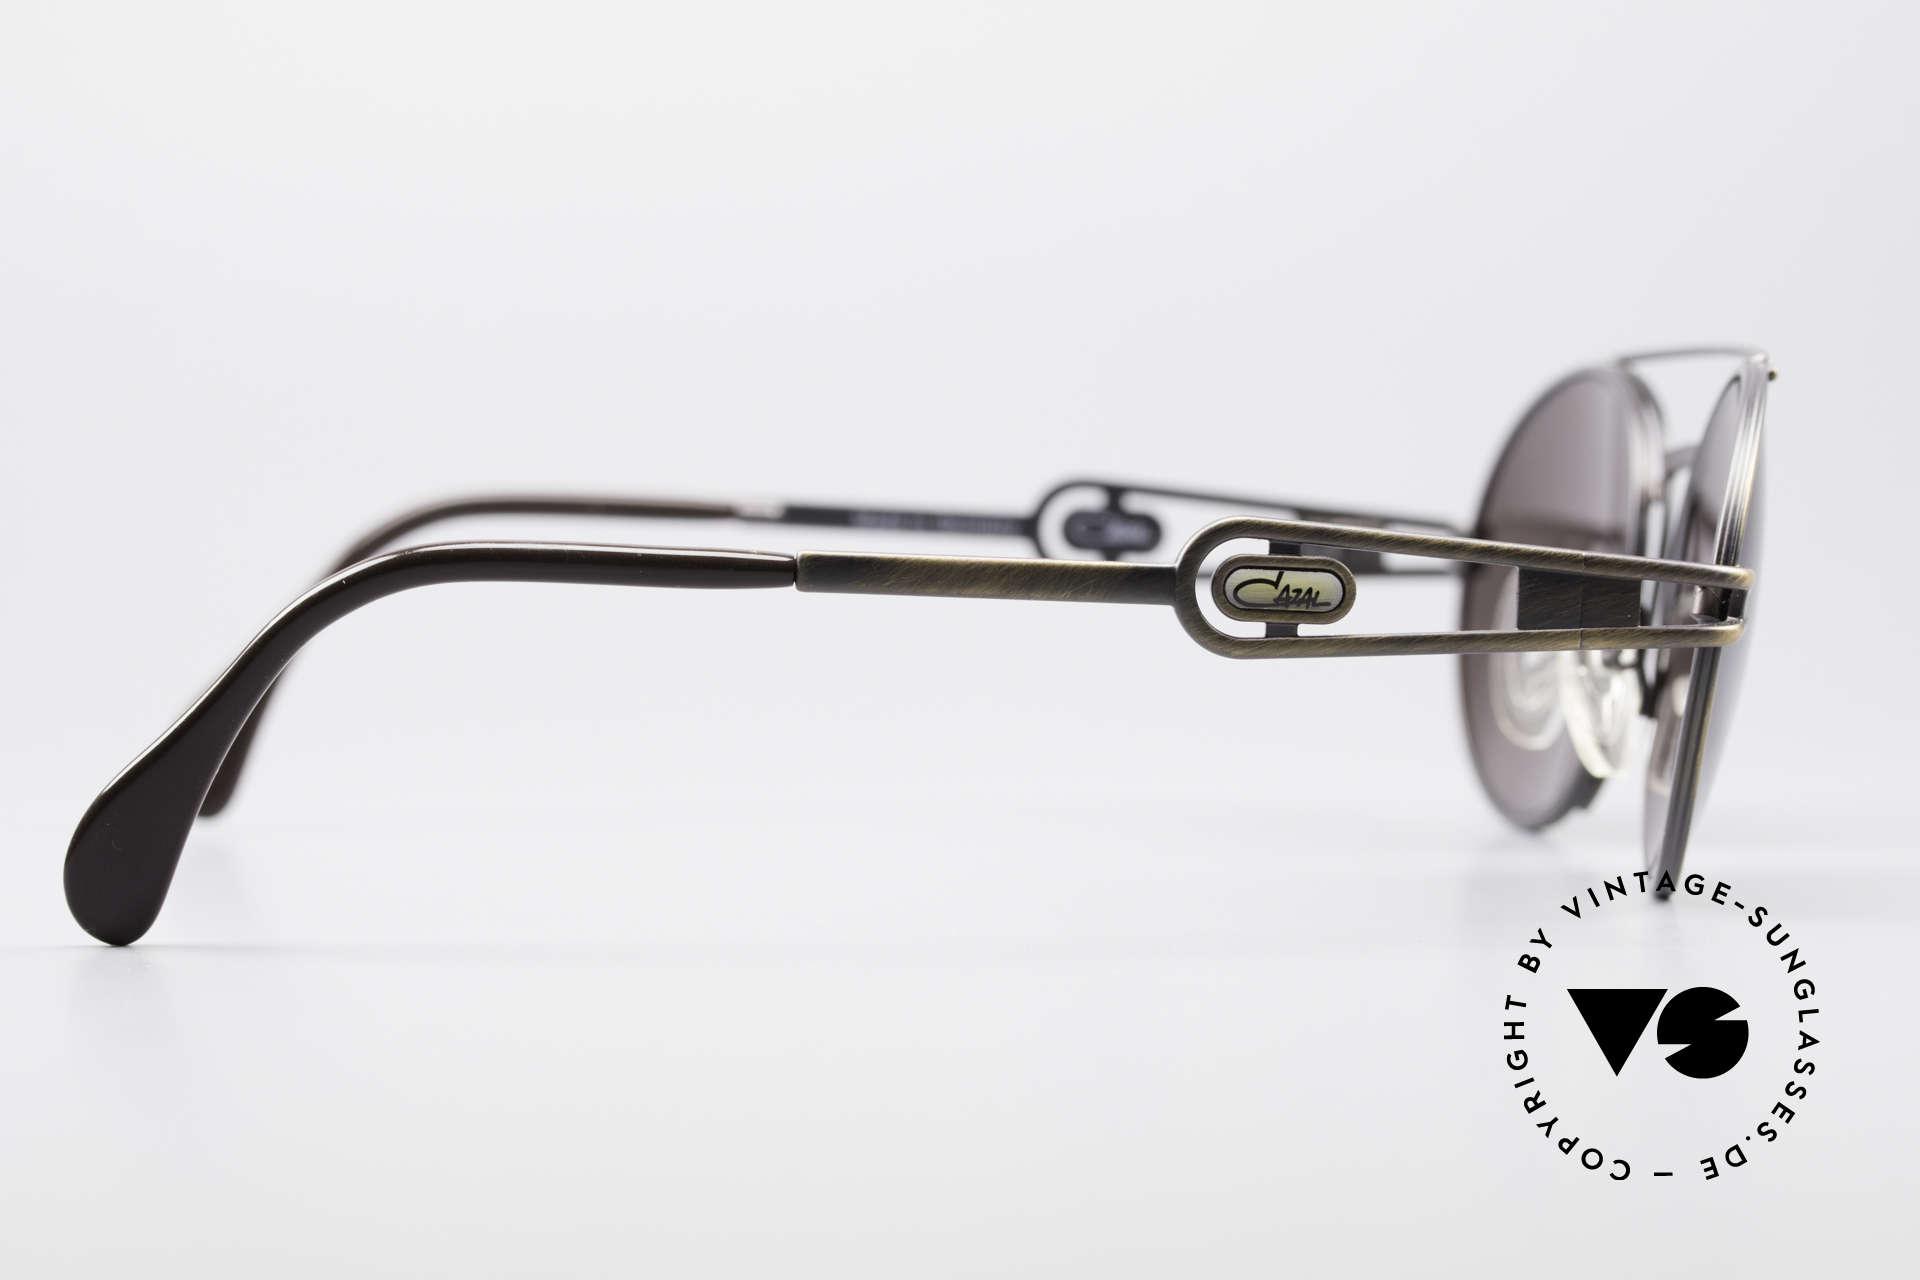 Cazal 965 Oval Steampunk Style Shades, Cazal sun lenses with 'UV Protection' mark (100% UV), Made for Men and Women